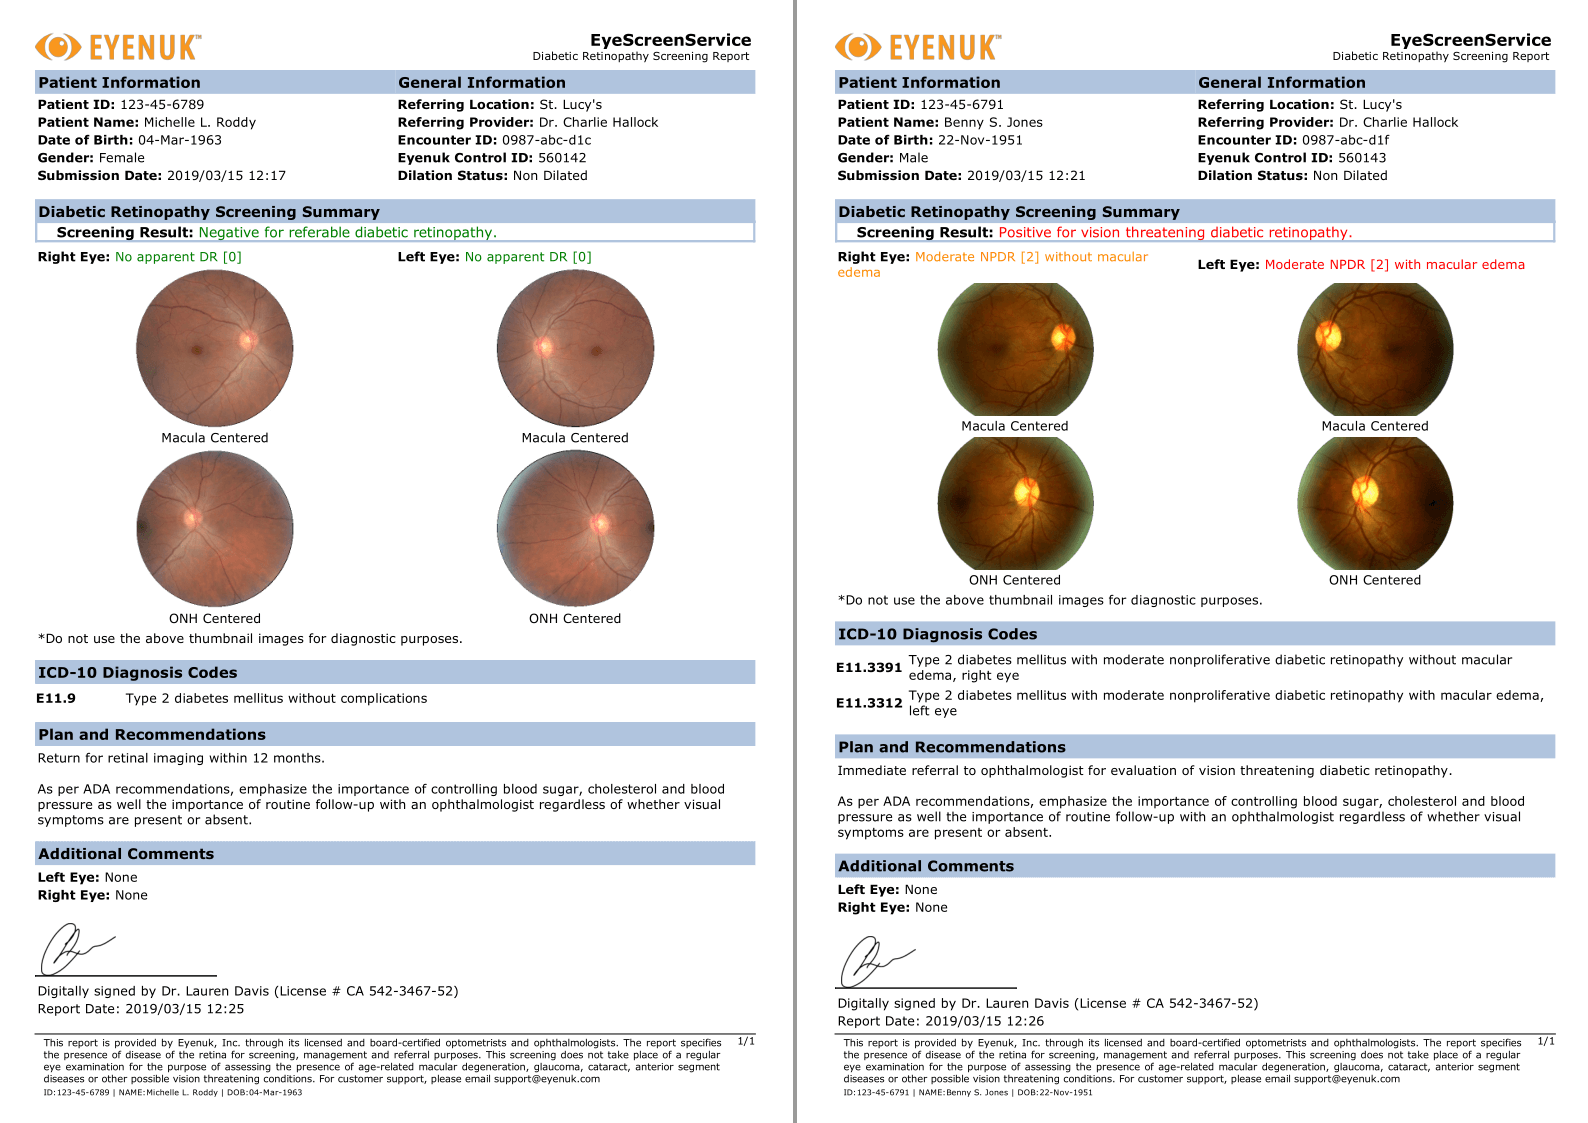 EyeScreenService_20190327